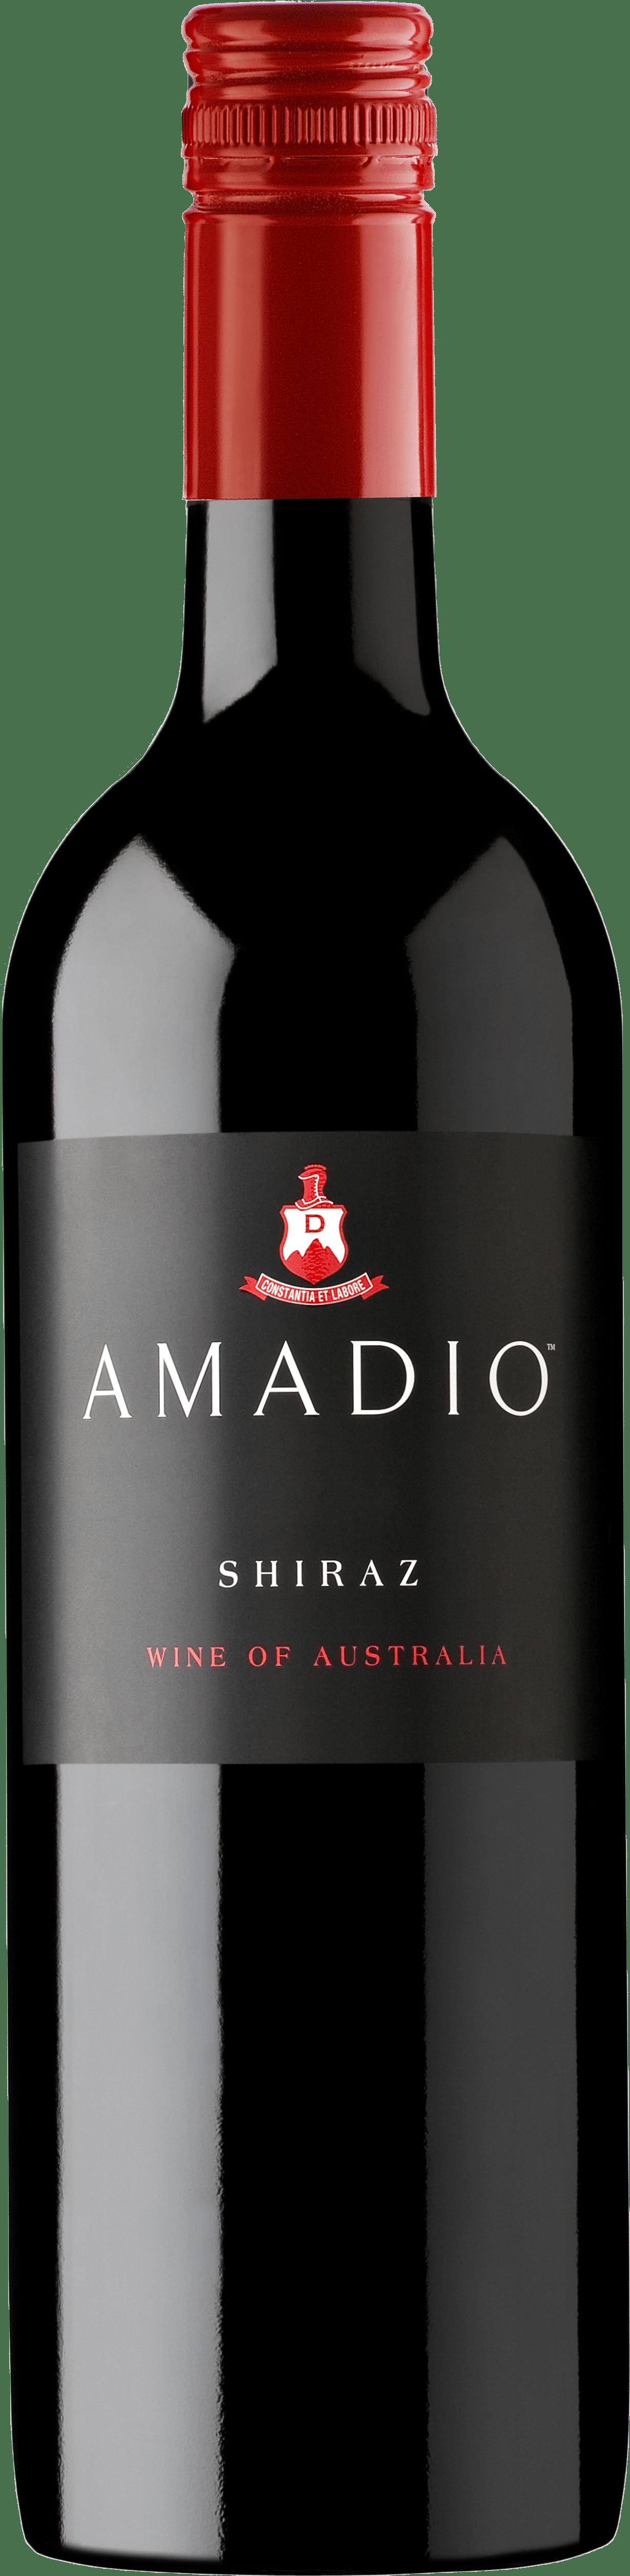 2019 Amadio Black Lablel Shiraz